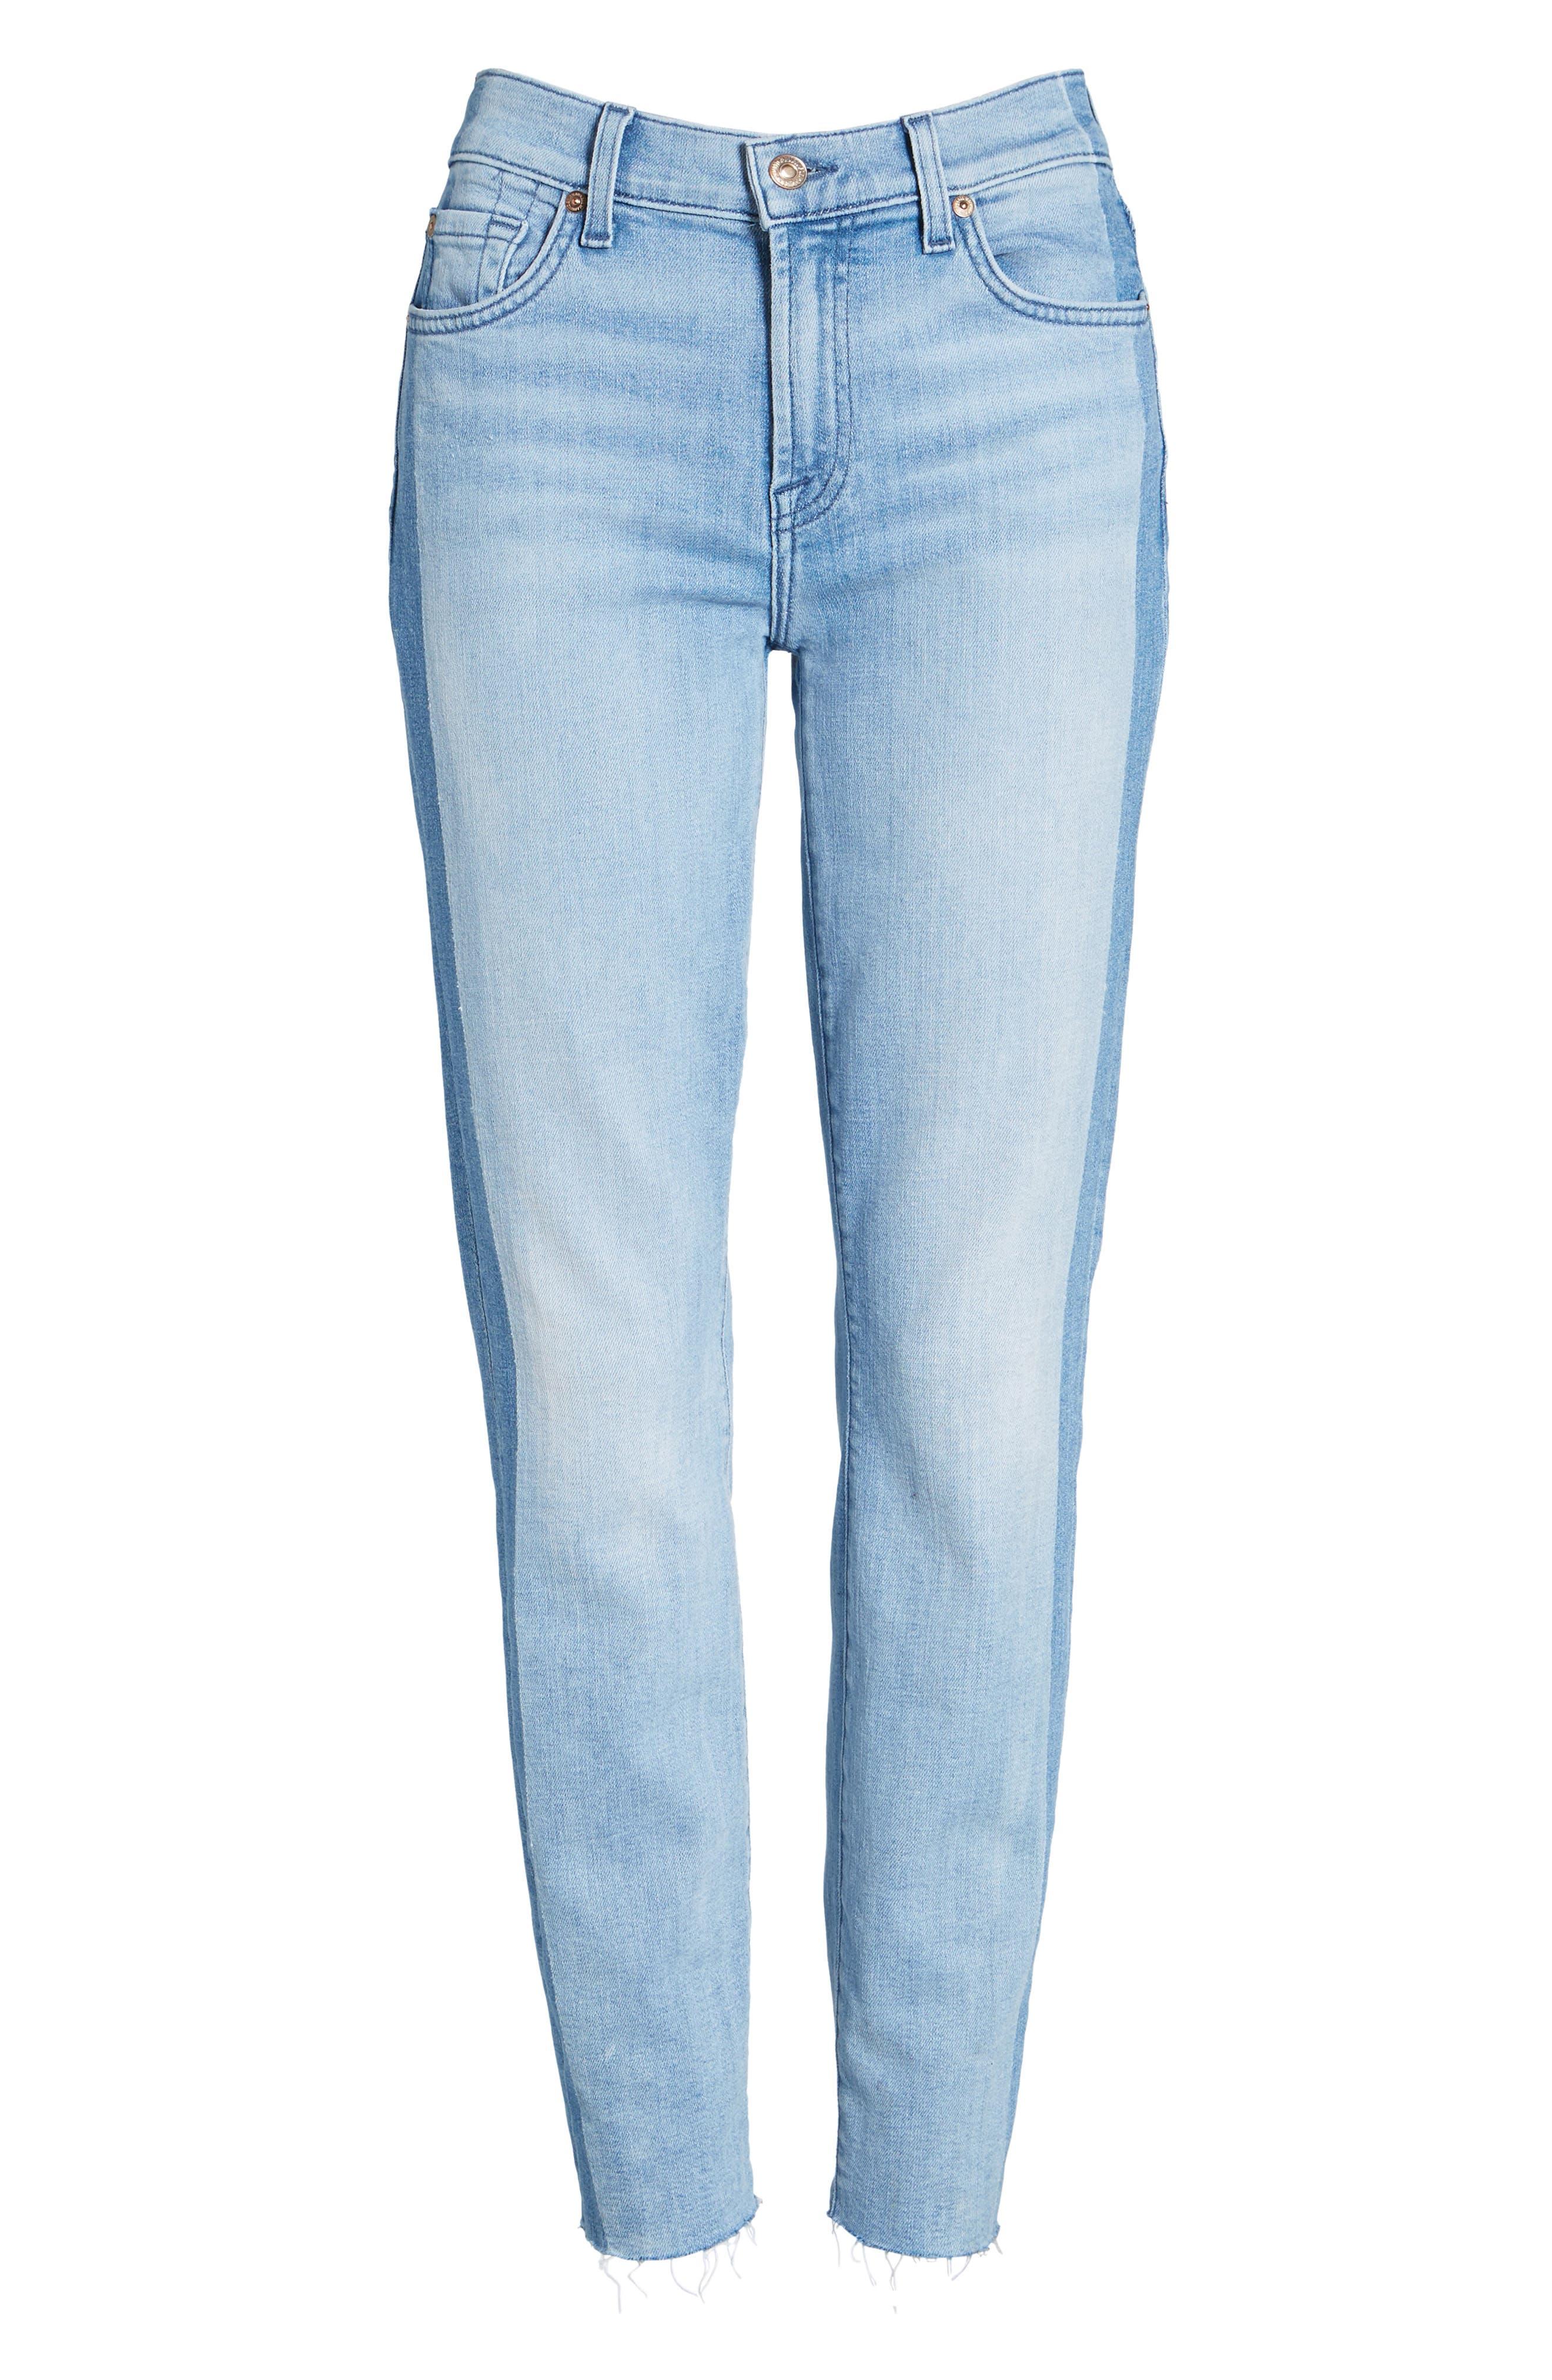 Roxanne Original Ankle Skinny Jeans,                             Alternate thumbnail 6, color,